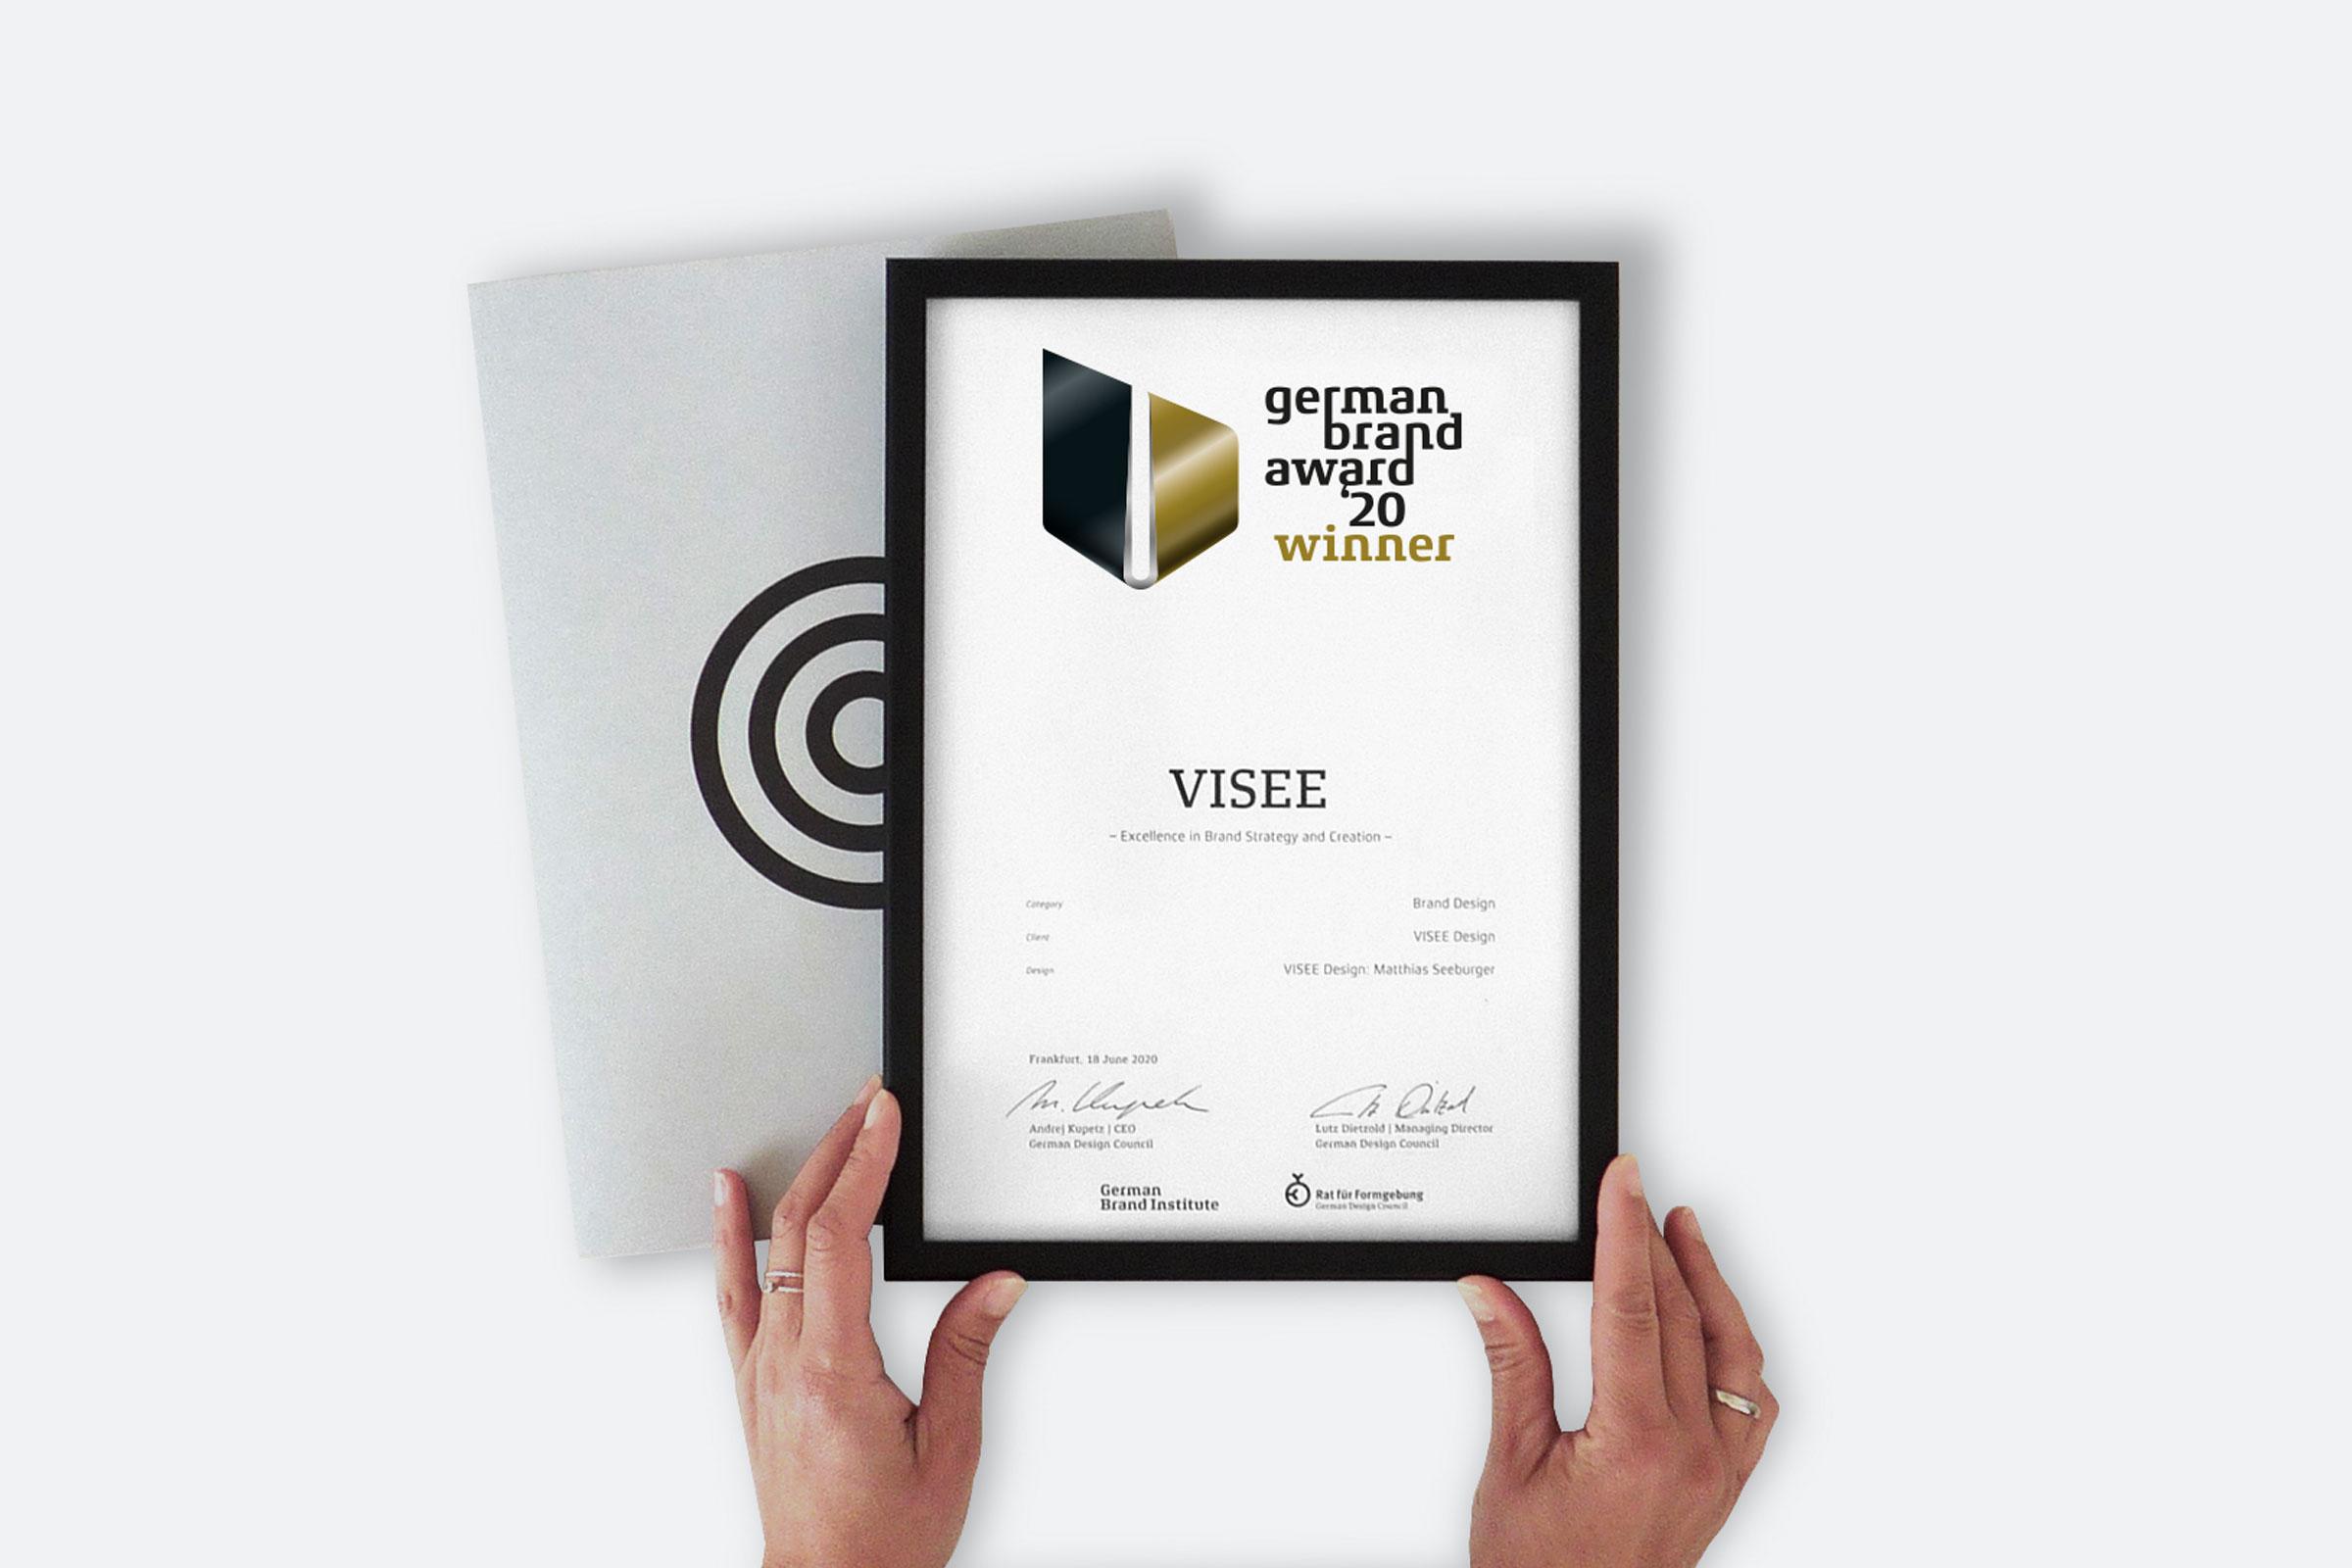 German Brand Award: Winner 2020